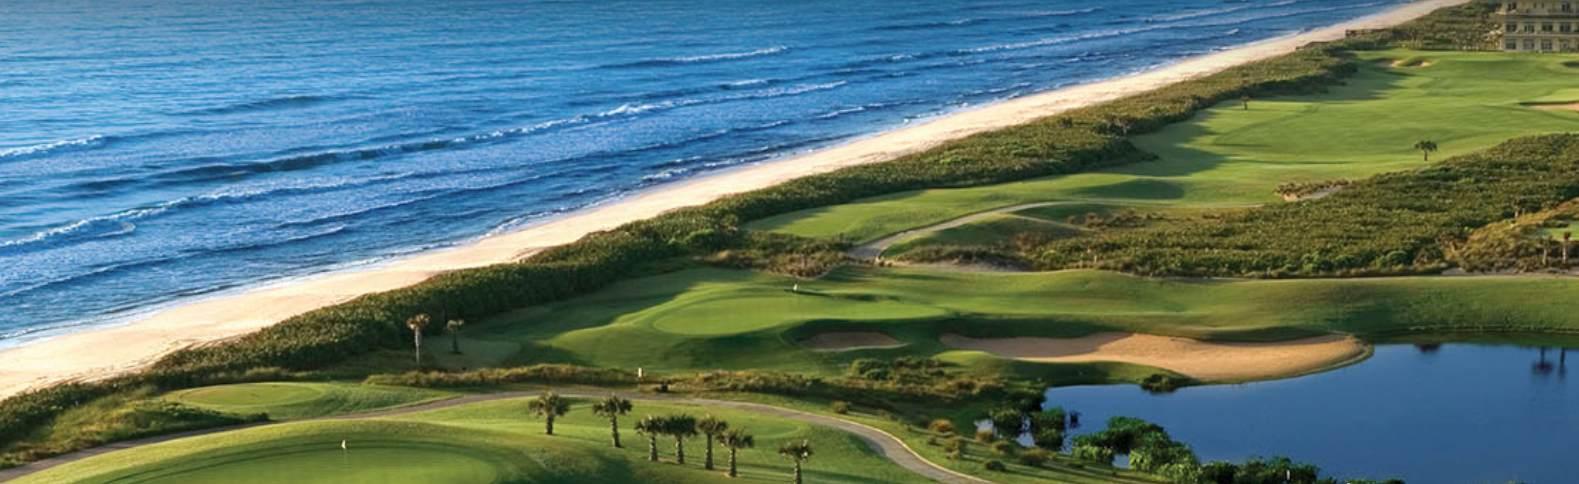 Hamock Beach Golf